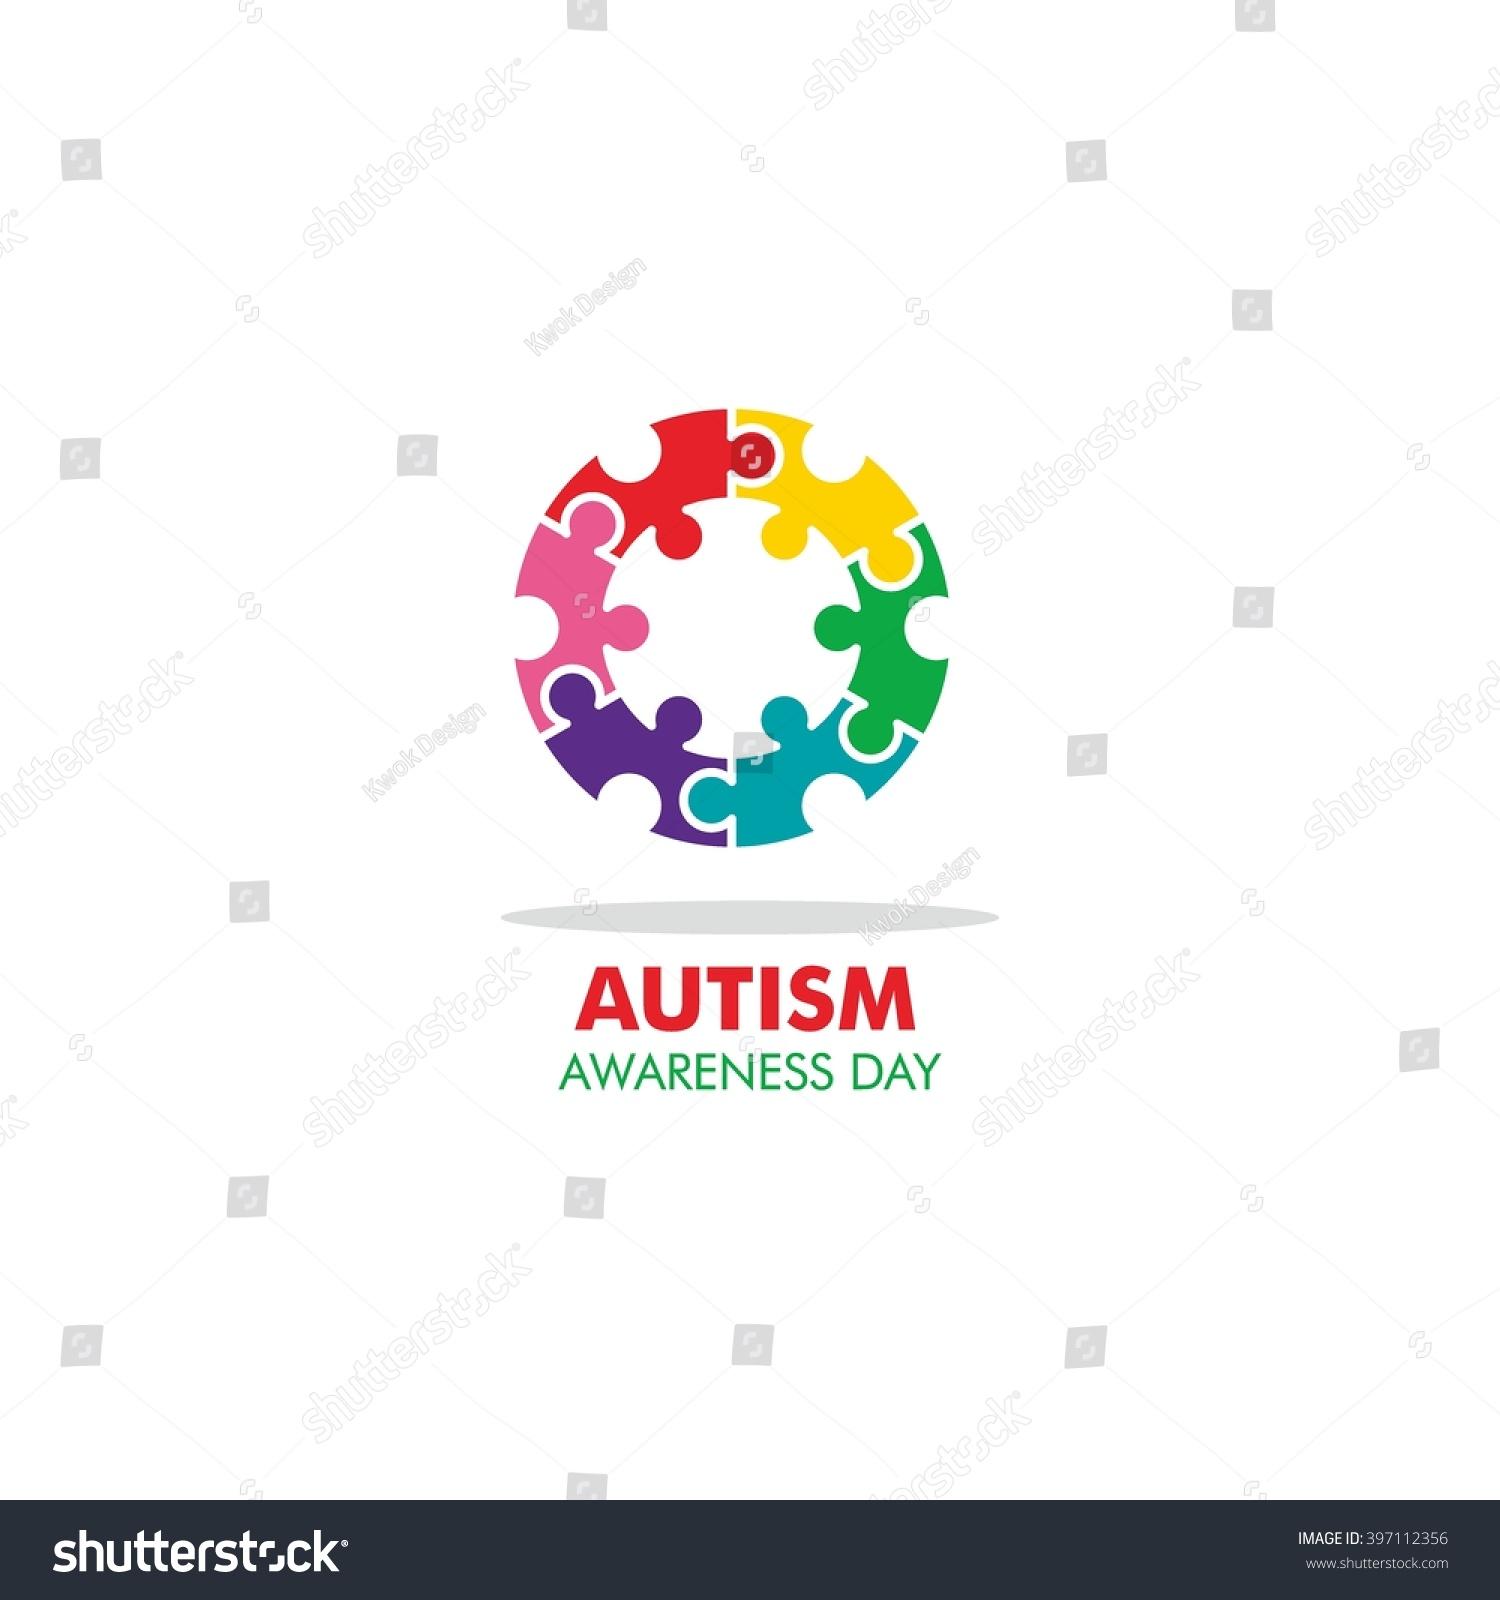 World autism awareness day logo design stock vector 397112356 world autism awareness day logo design template vector illustration colorful puzzles symbol biocorpaavc